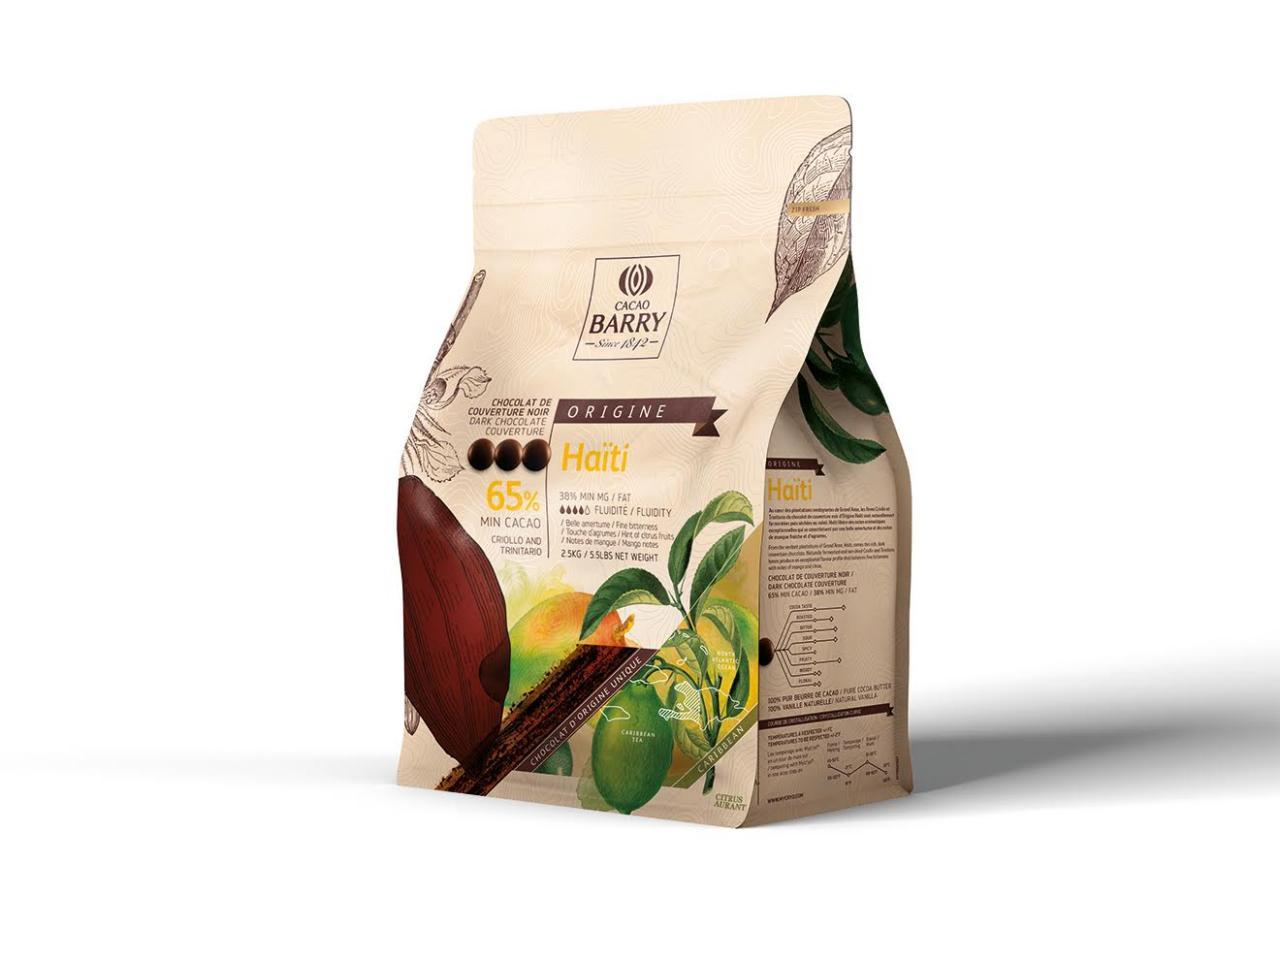 Cacao Barry Haiti Chocolate